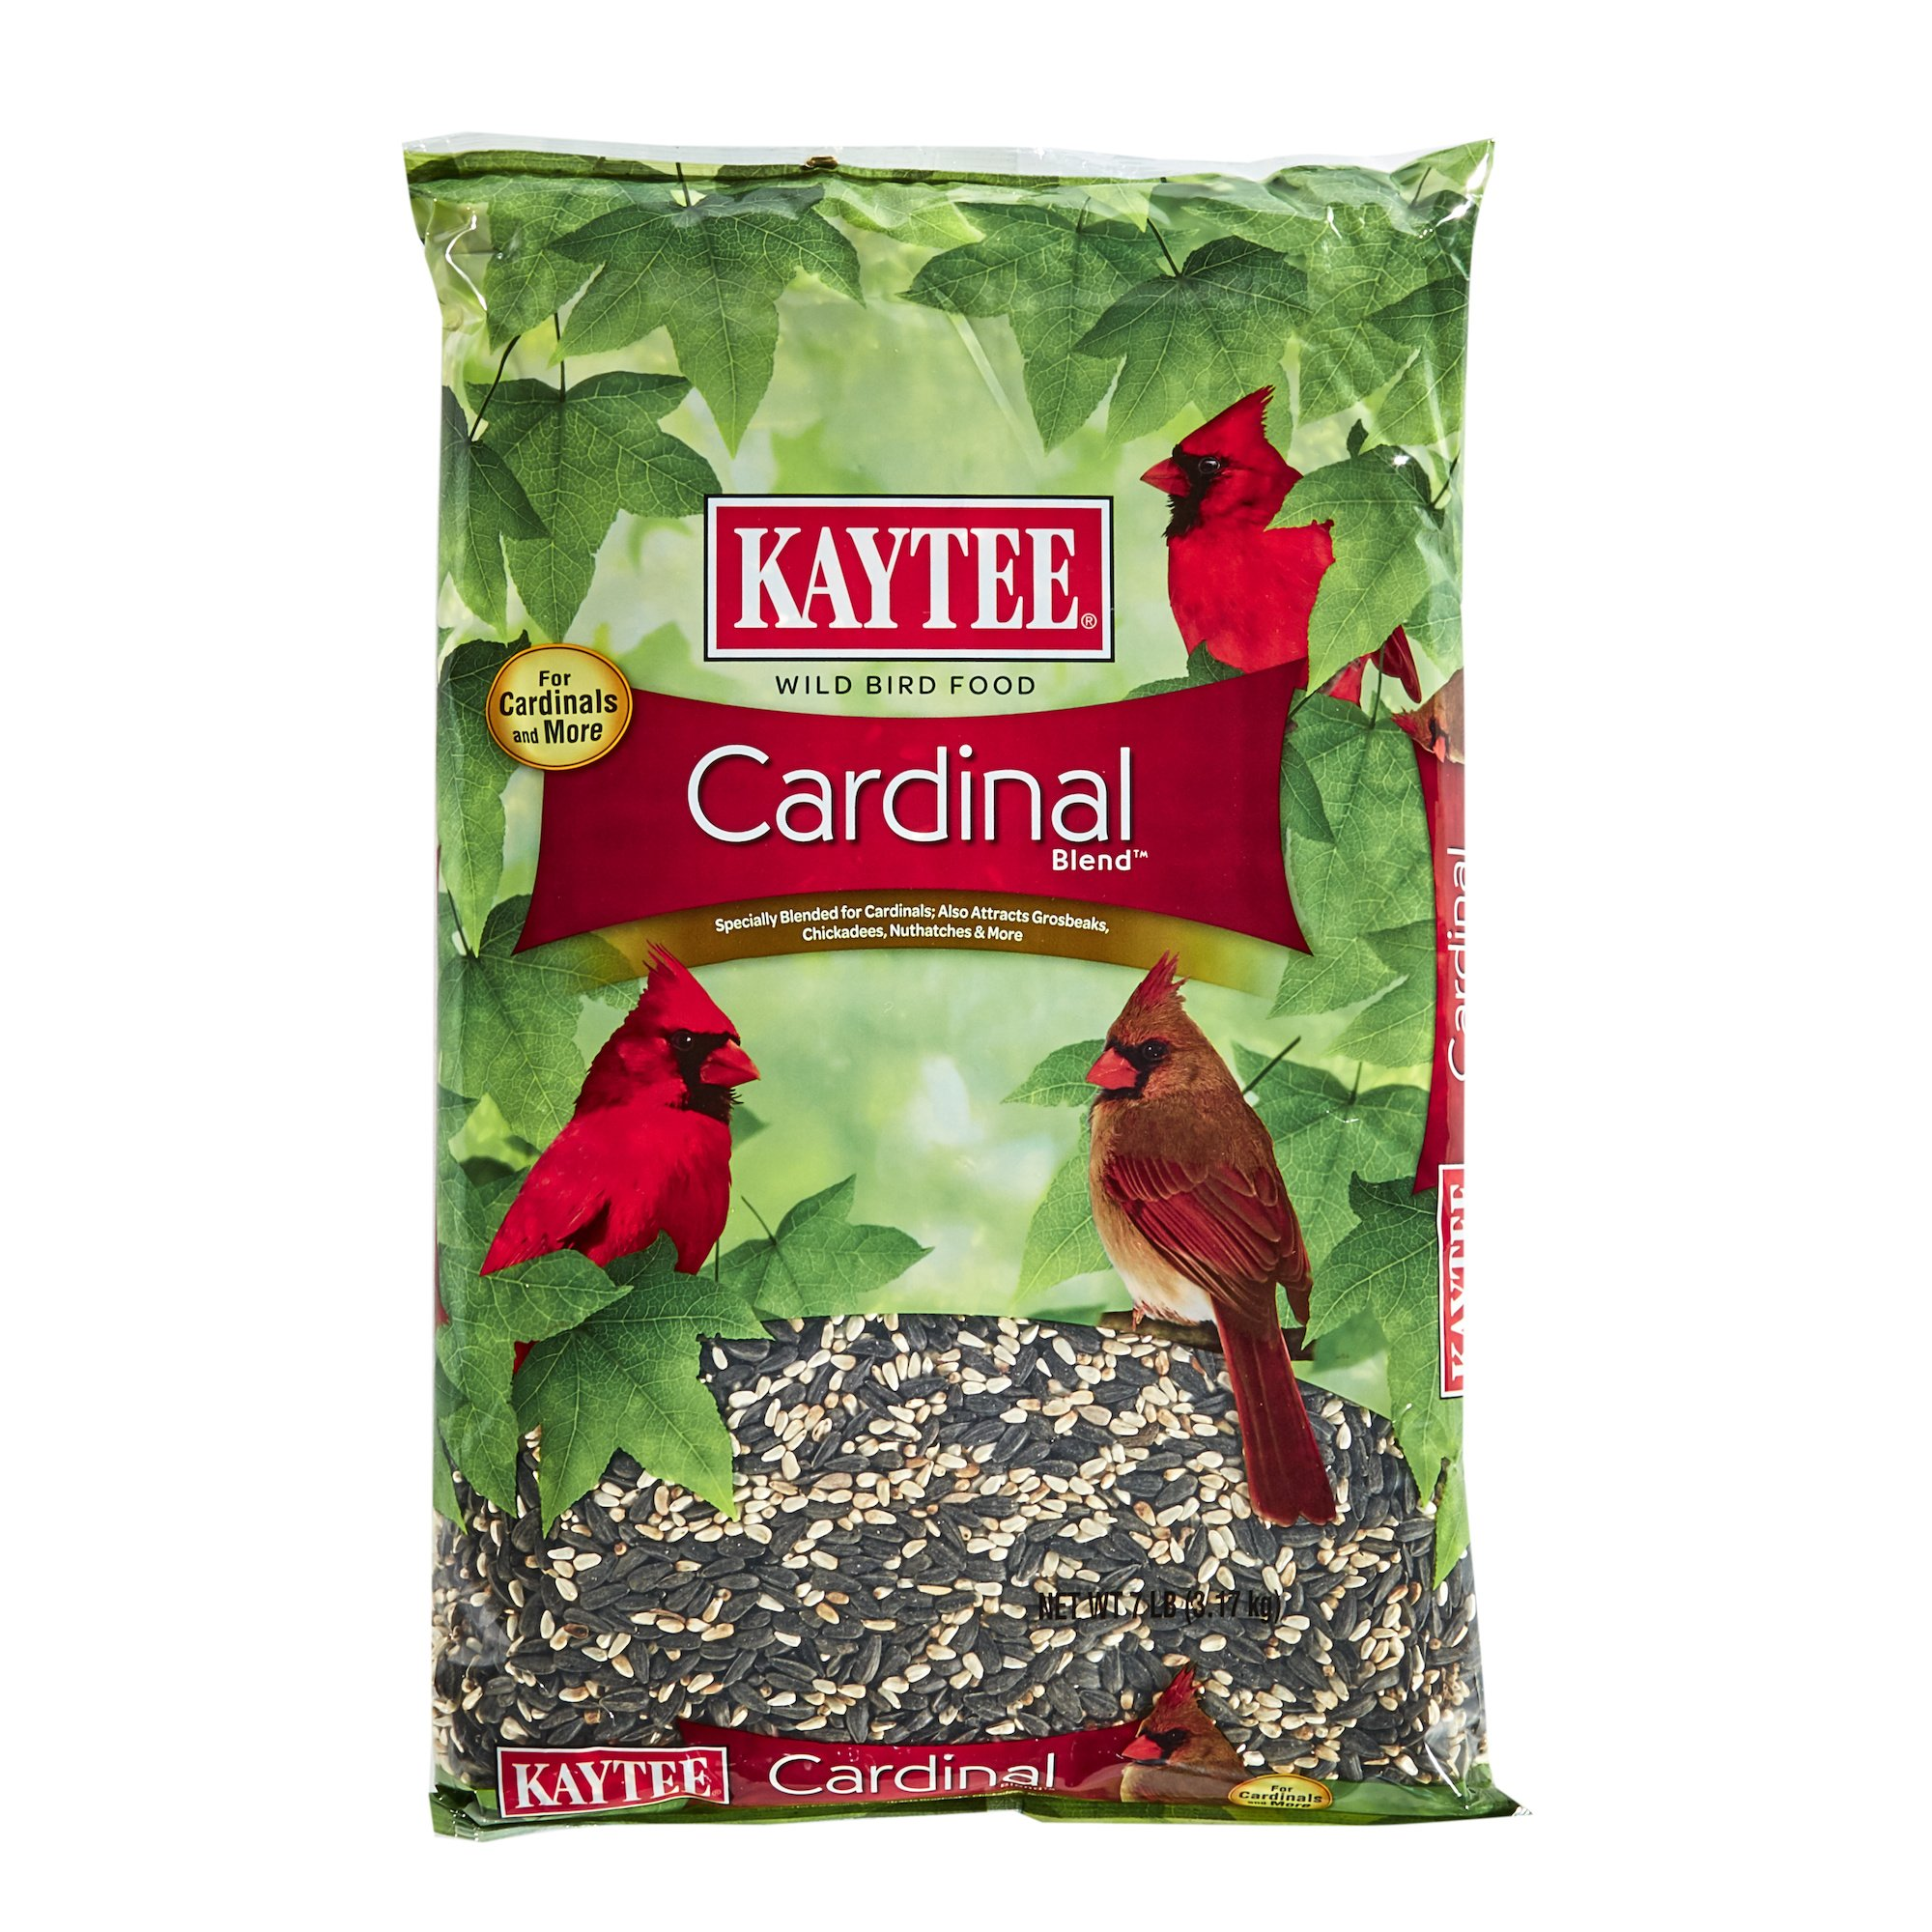 Kaytee Cardinal Blend, 7-Pound Bag